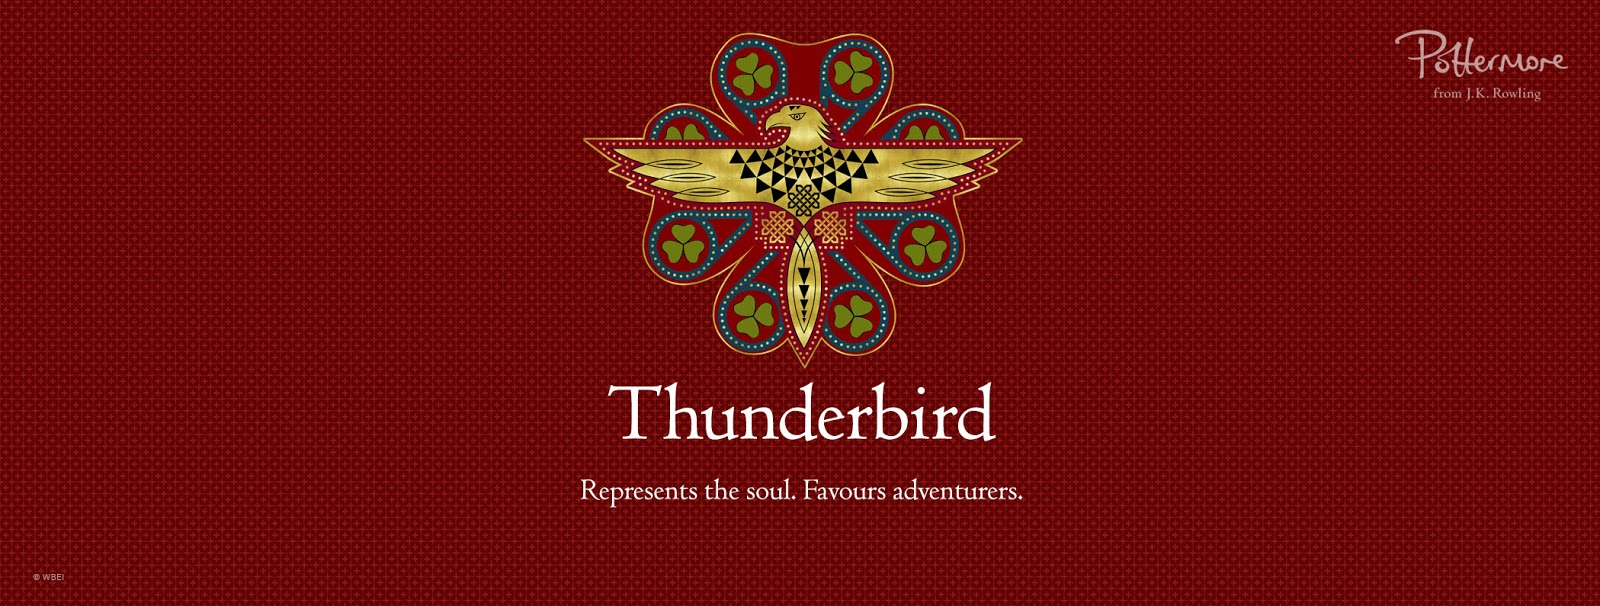 Most Inspiring Wallpaper Harry Potter Pottermore - Ilvermorny_Wallpapers_Thunderbird  Photograph_26964.jpg